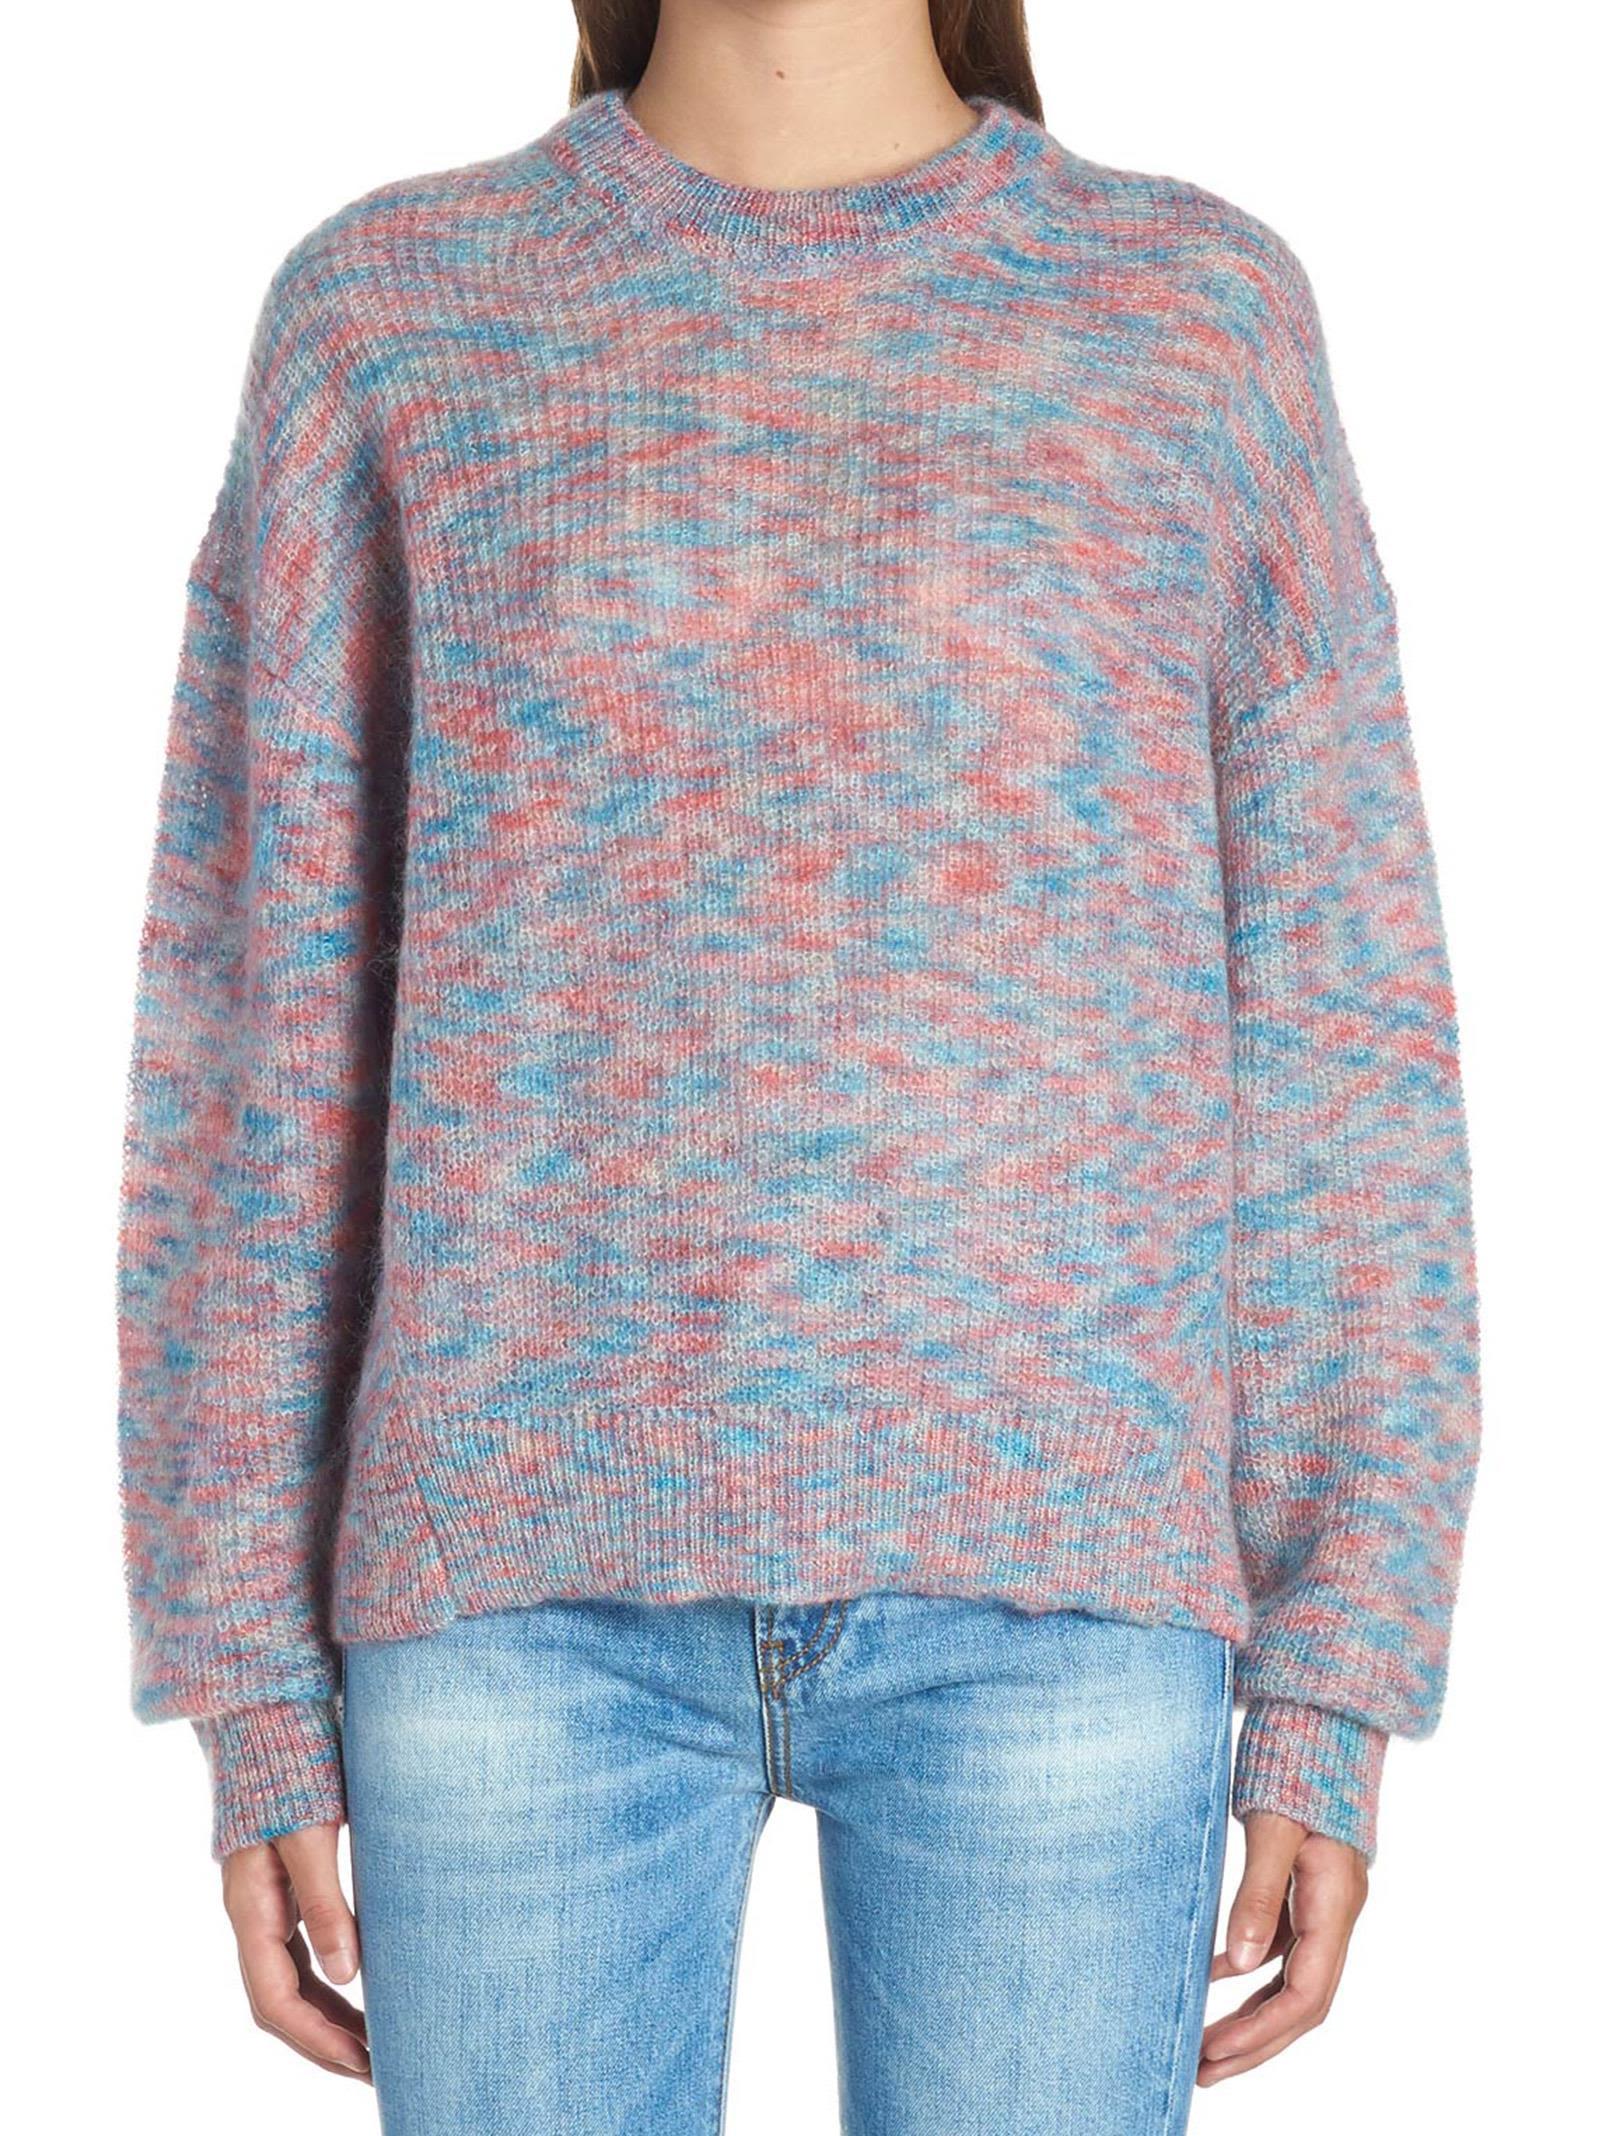 Iro 'version' Sweater